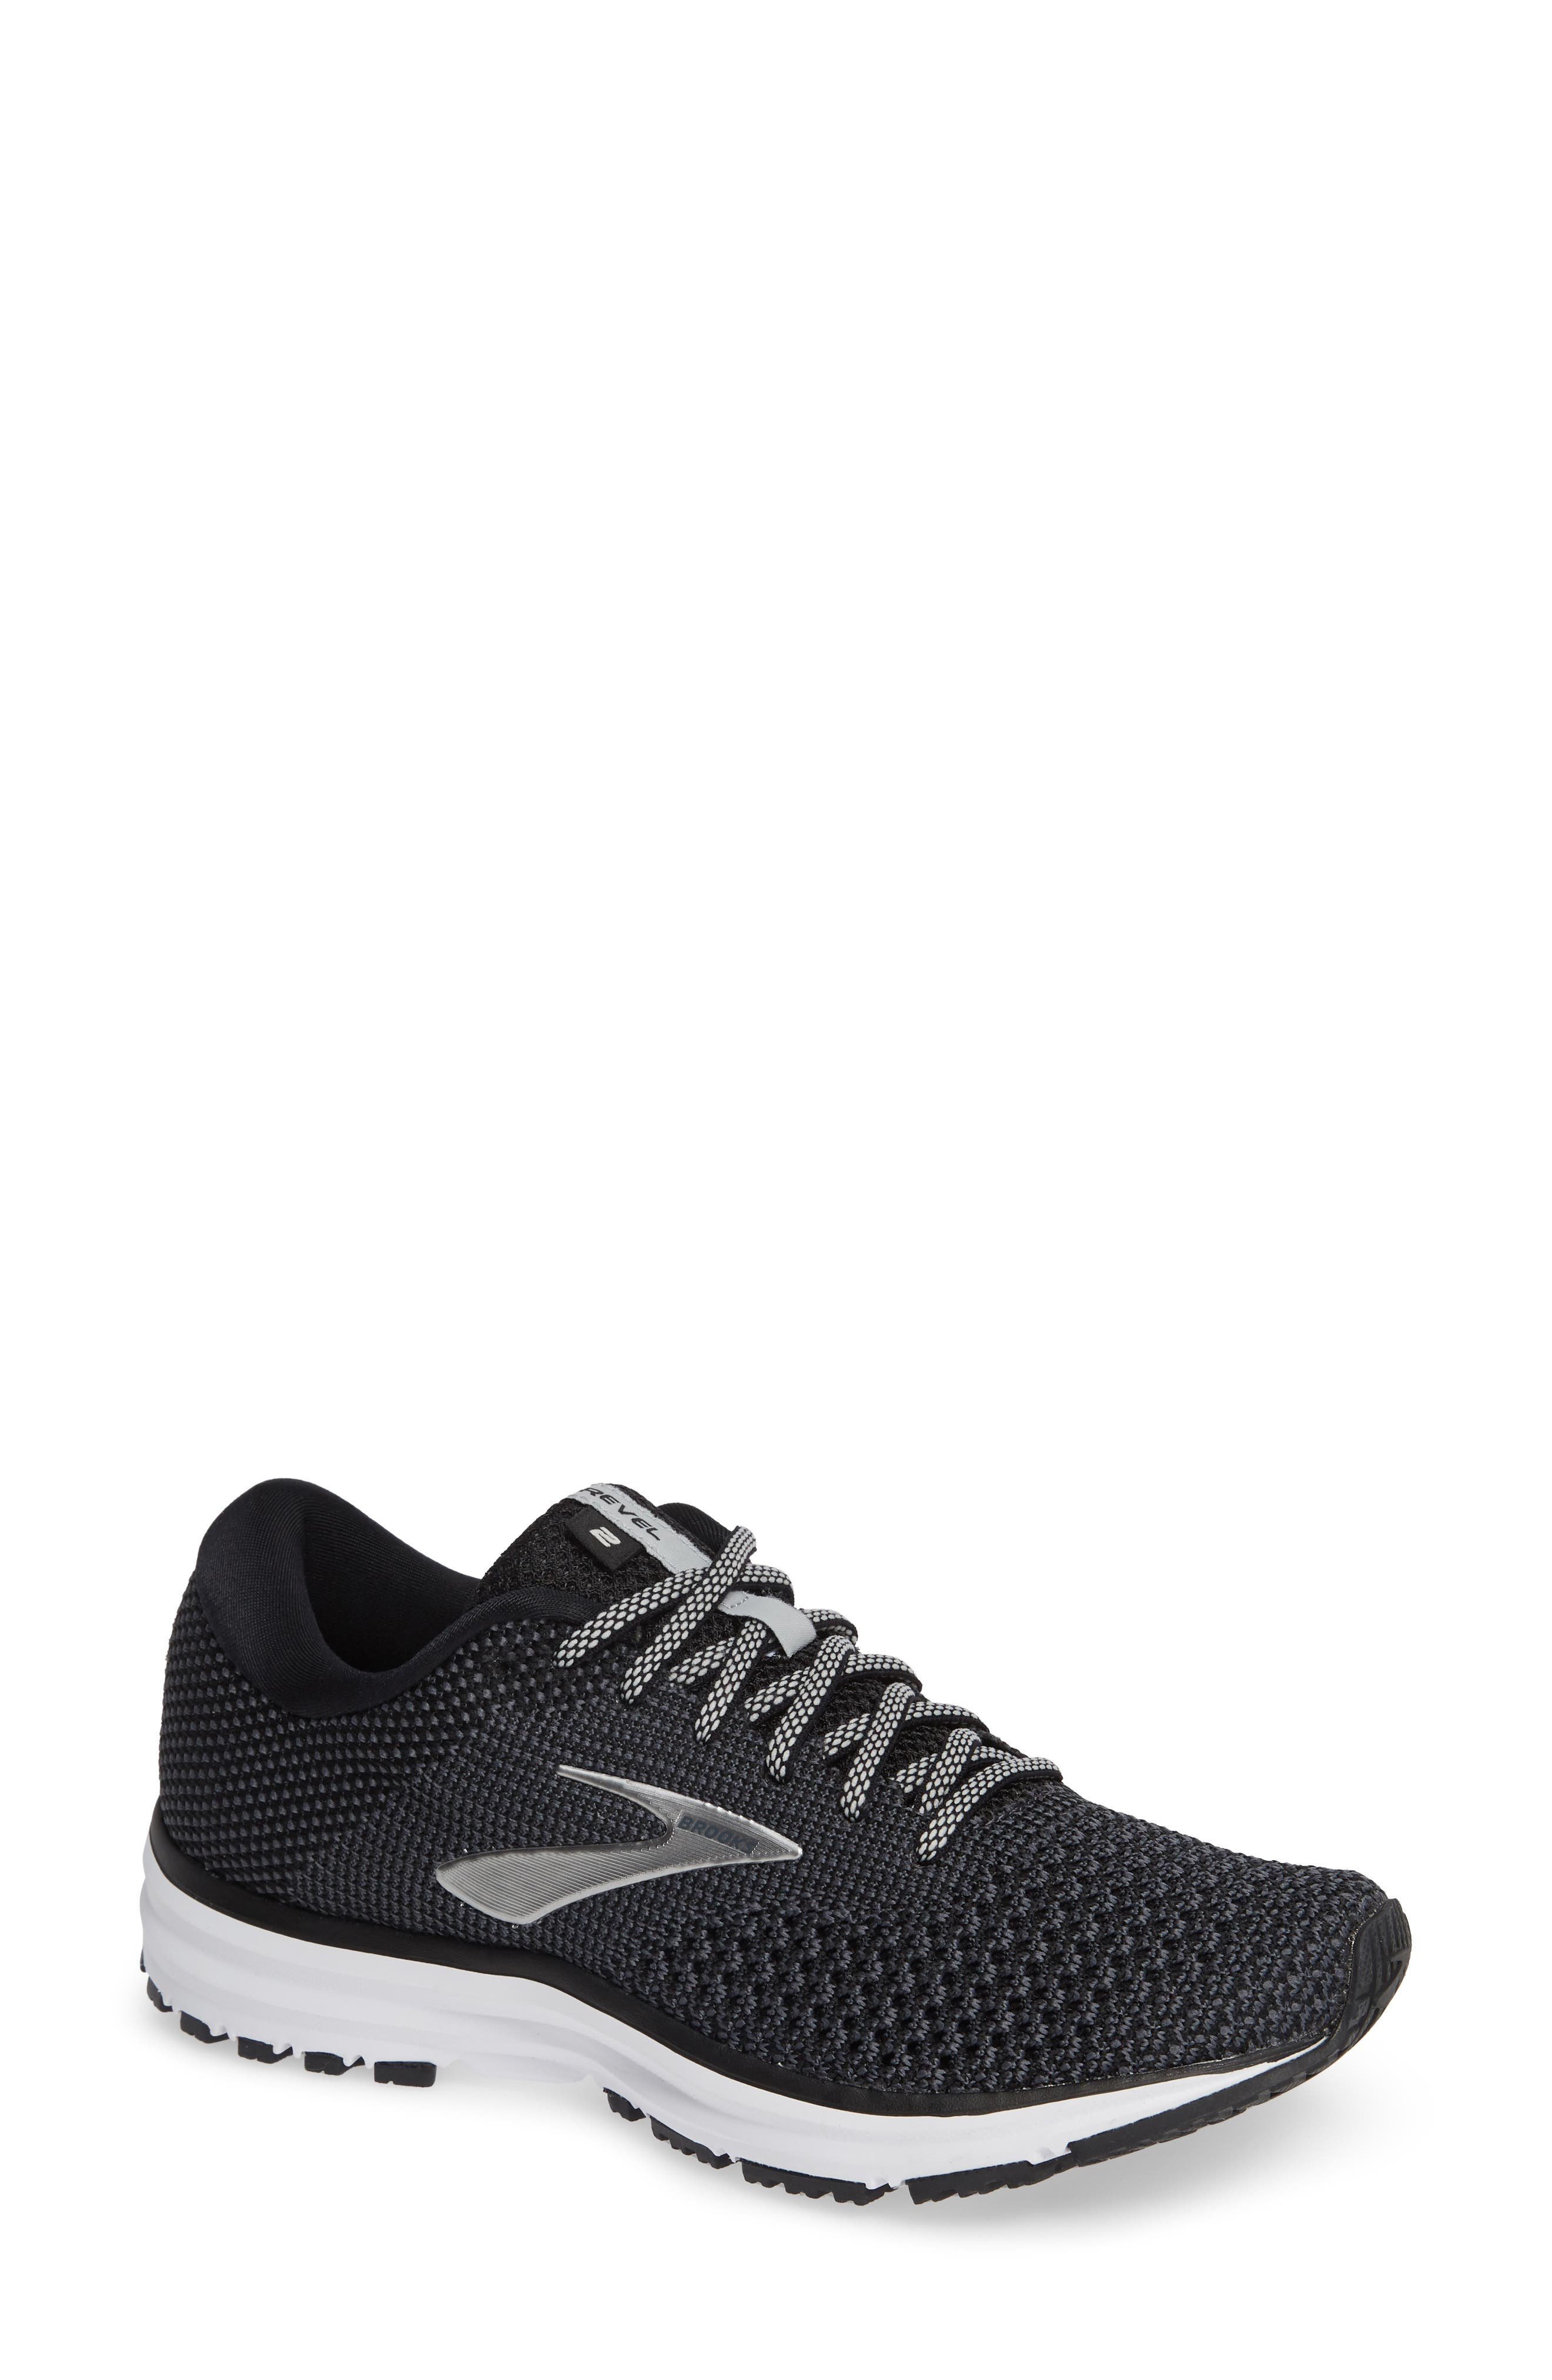 Revel 2 Running Shoe, Main, color, BLACK/ GREY/ GREY